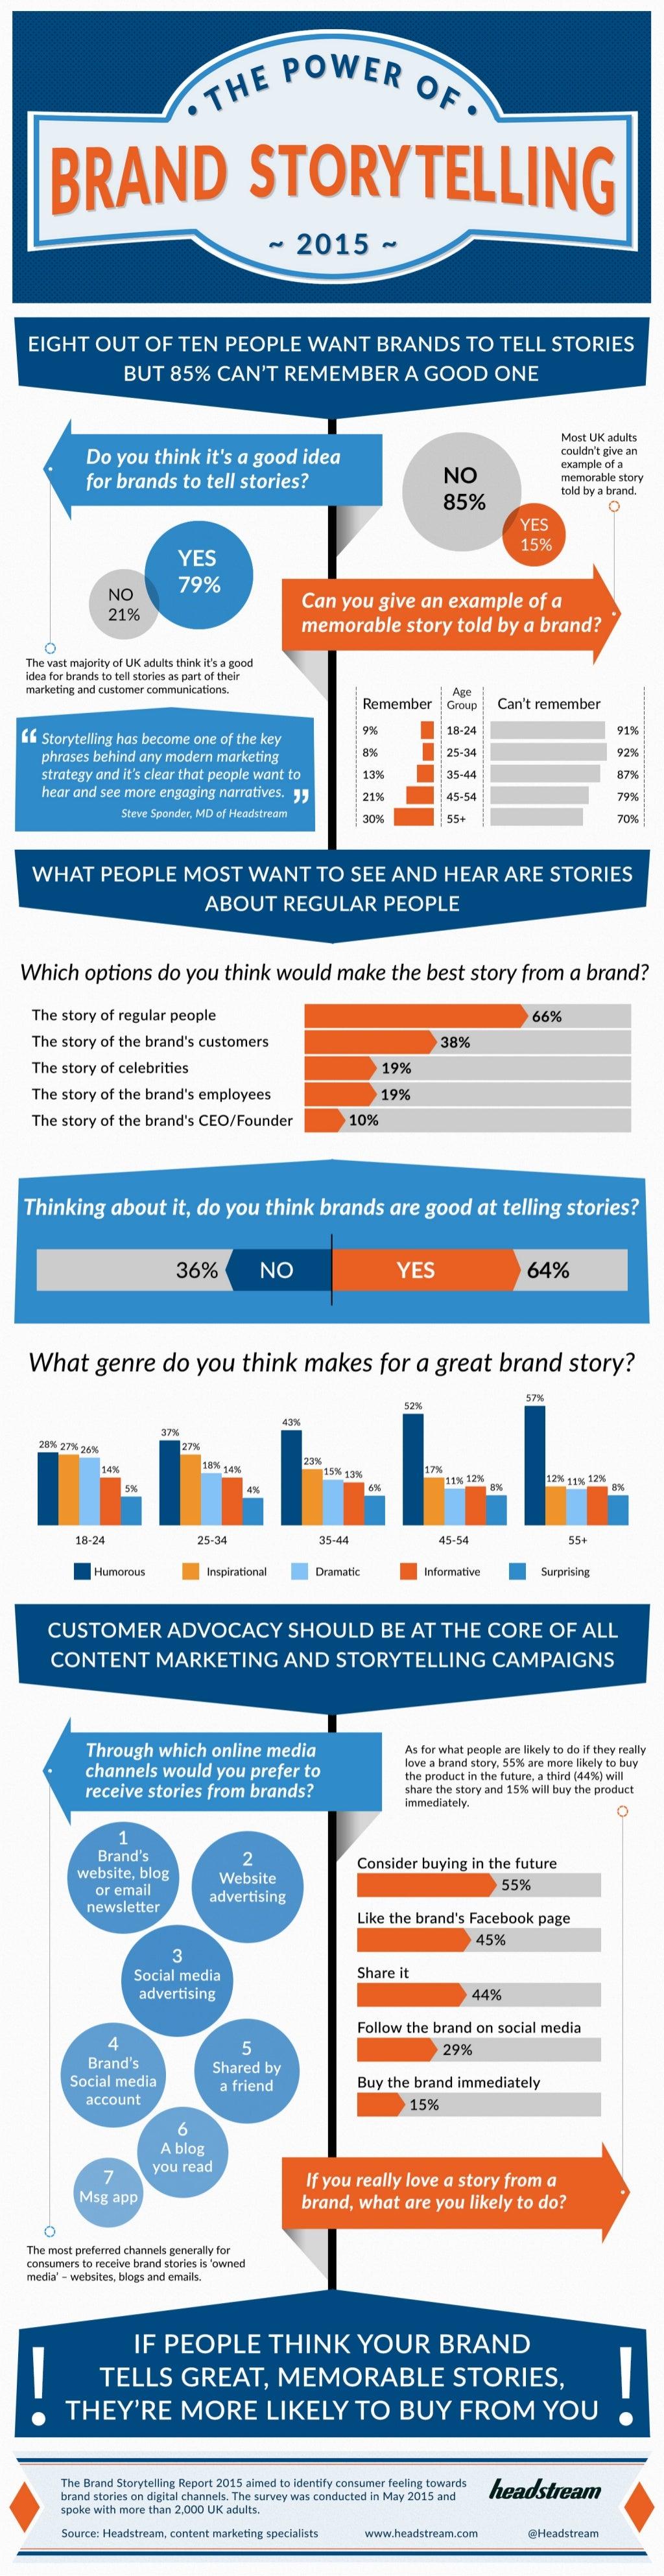 the power of brand storytelling